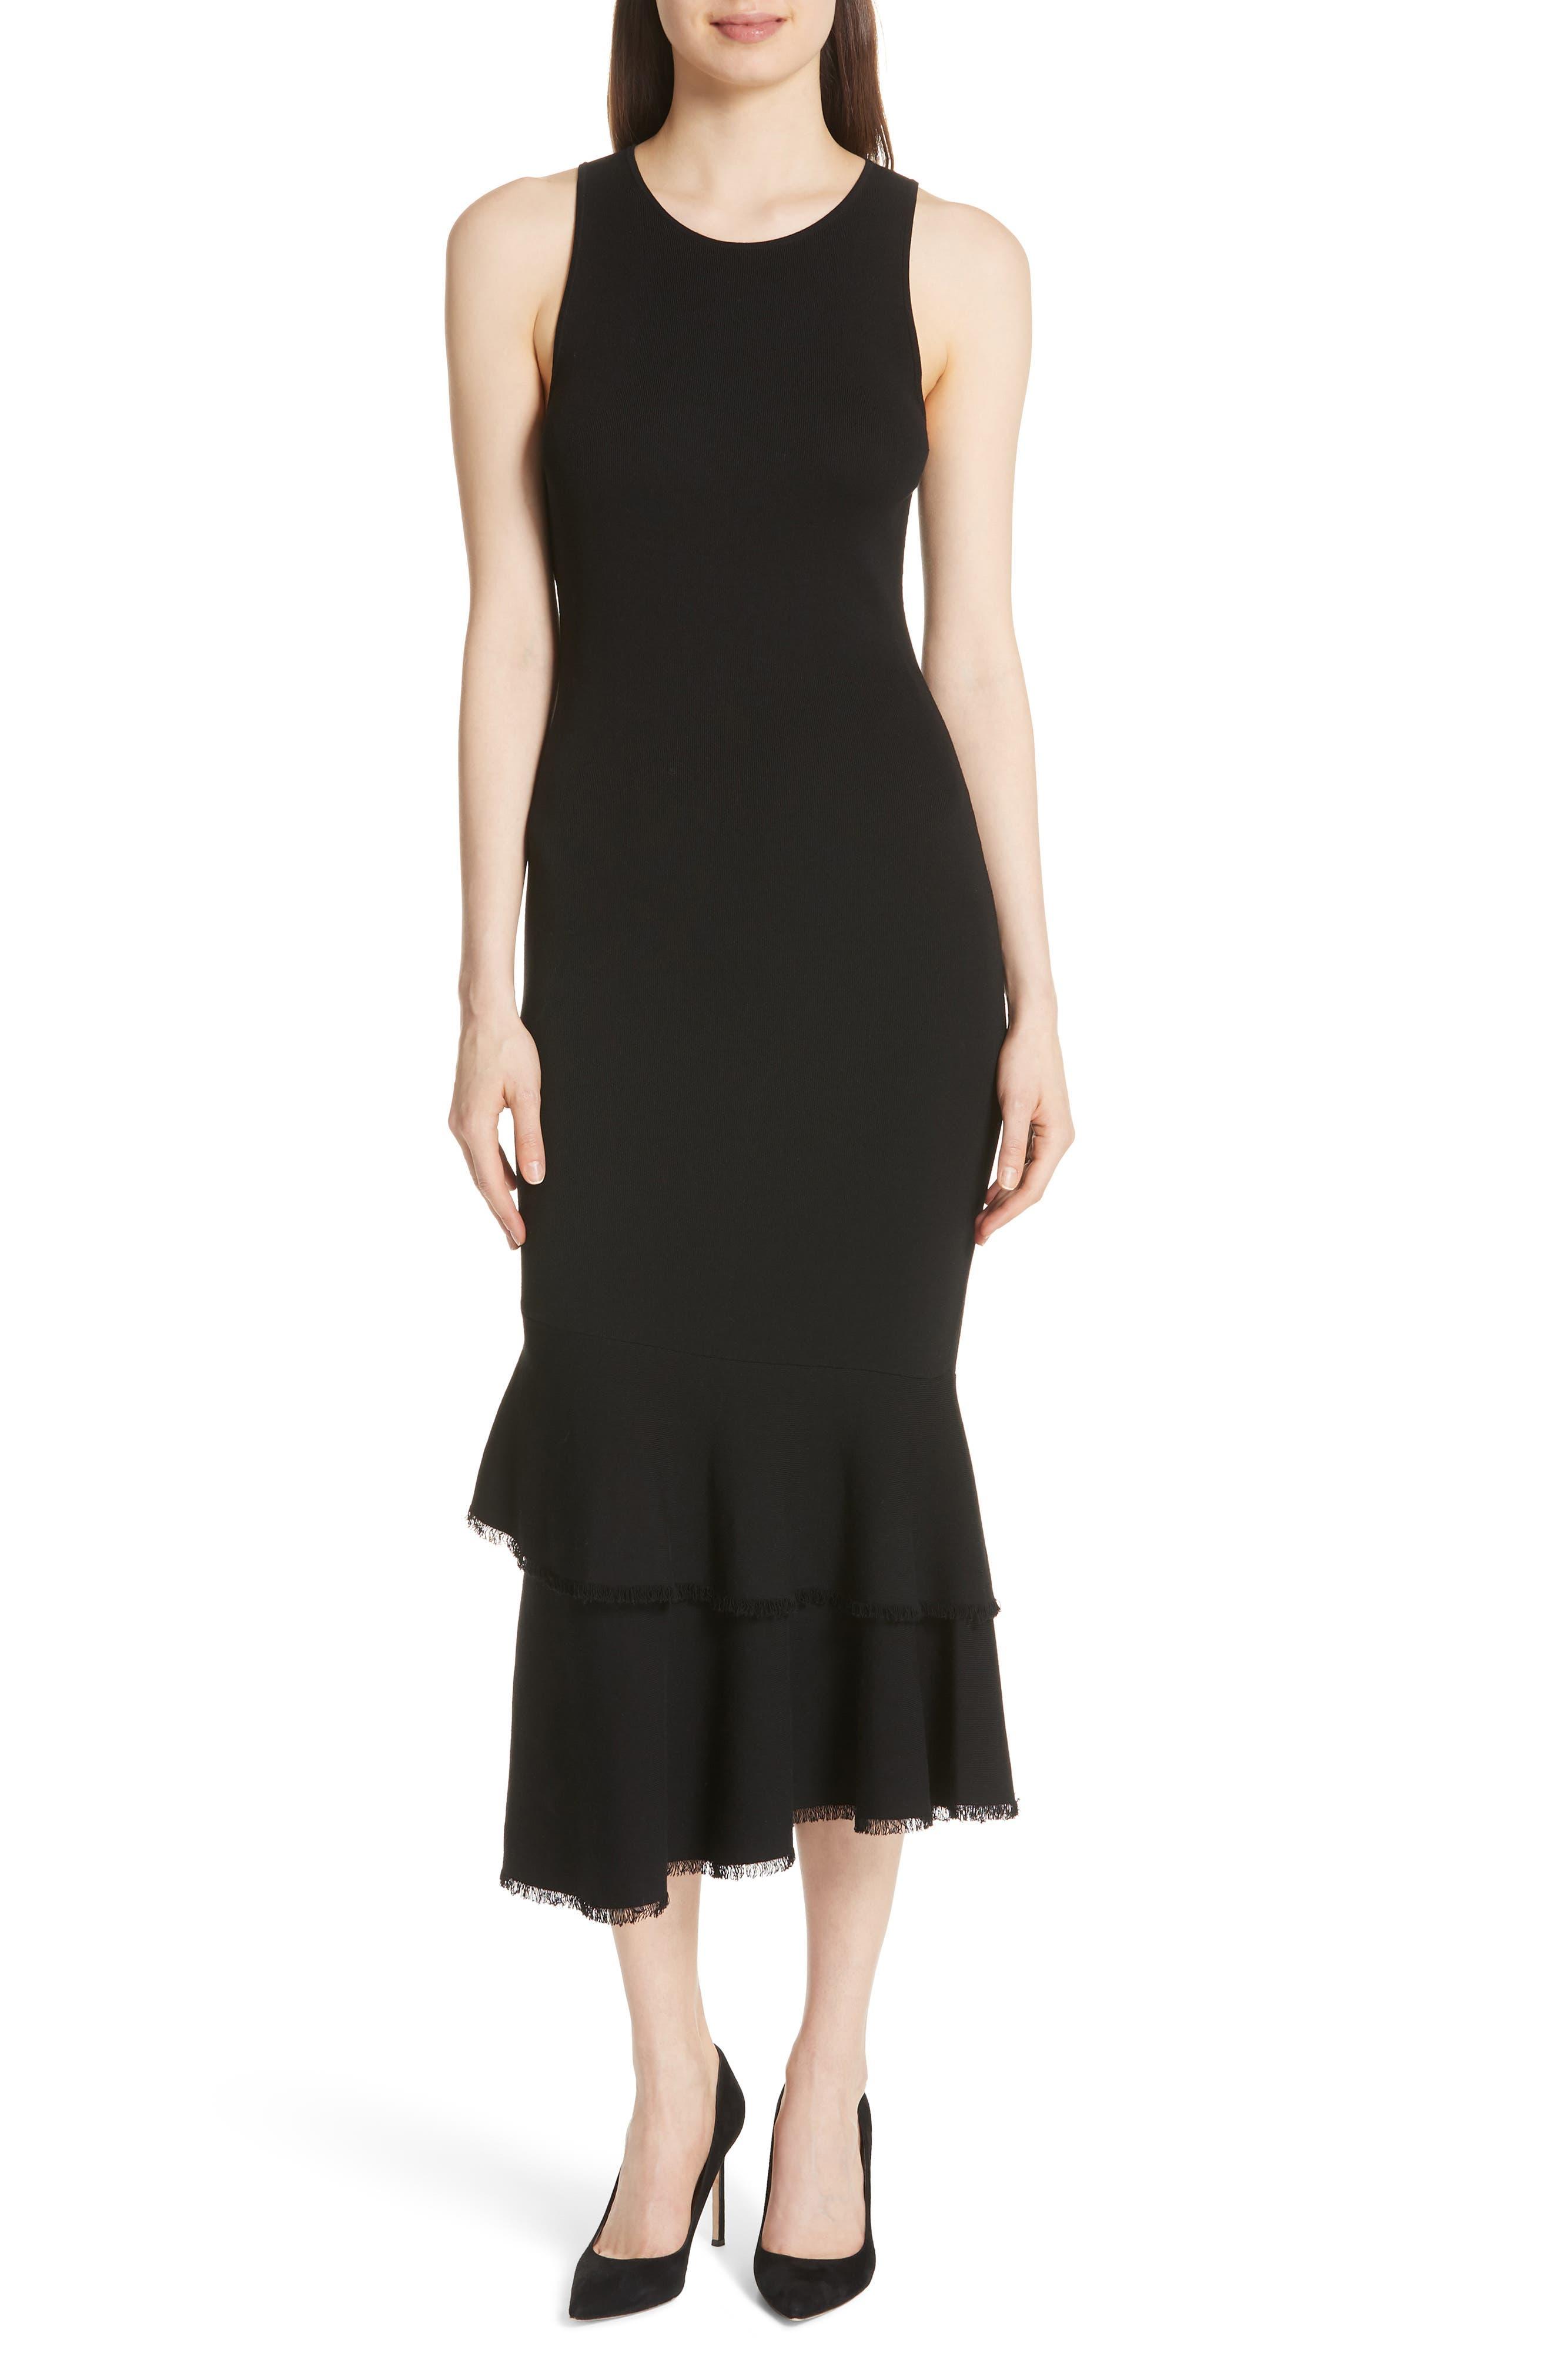 Nilimary Prosecco Midi Dress,                             Main thumbnail 1, color,                             Black